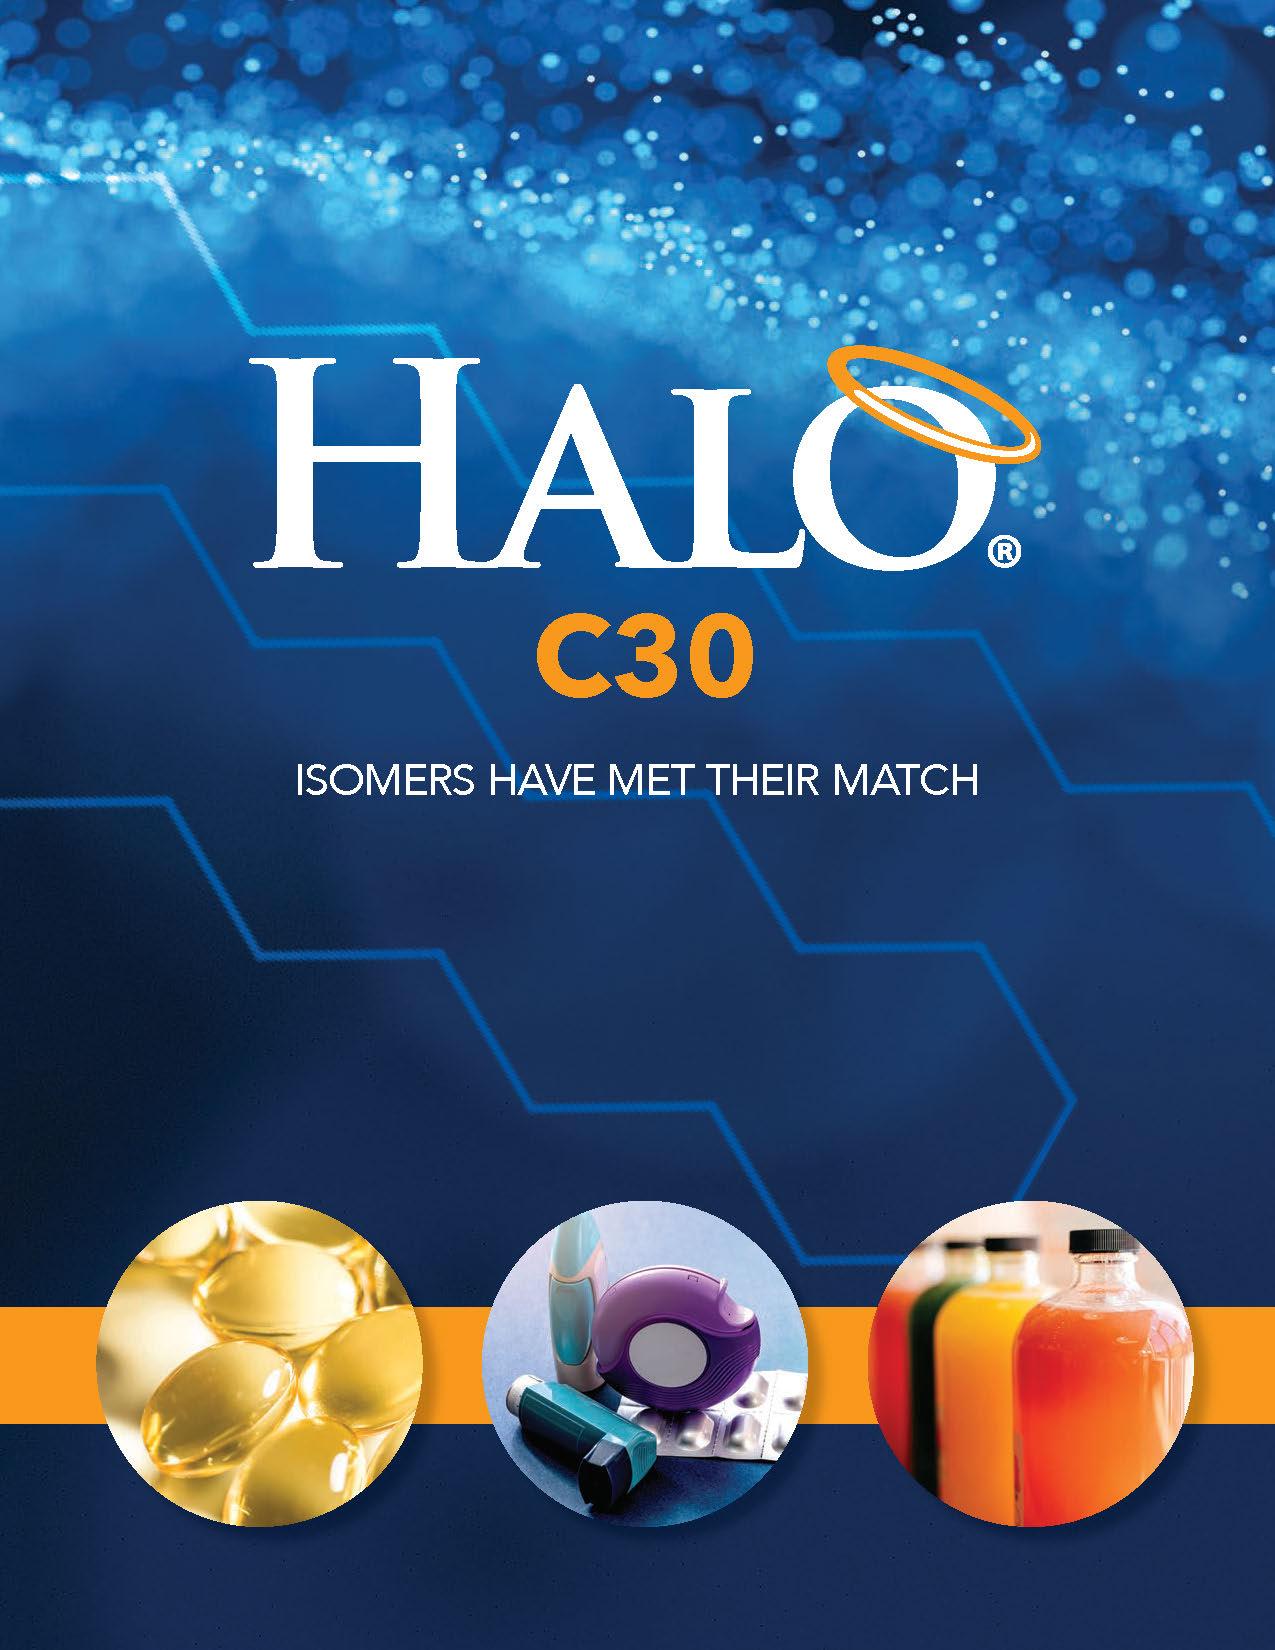 halo c30 column